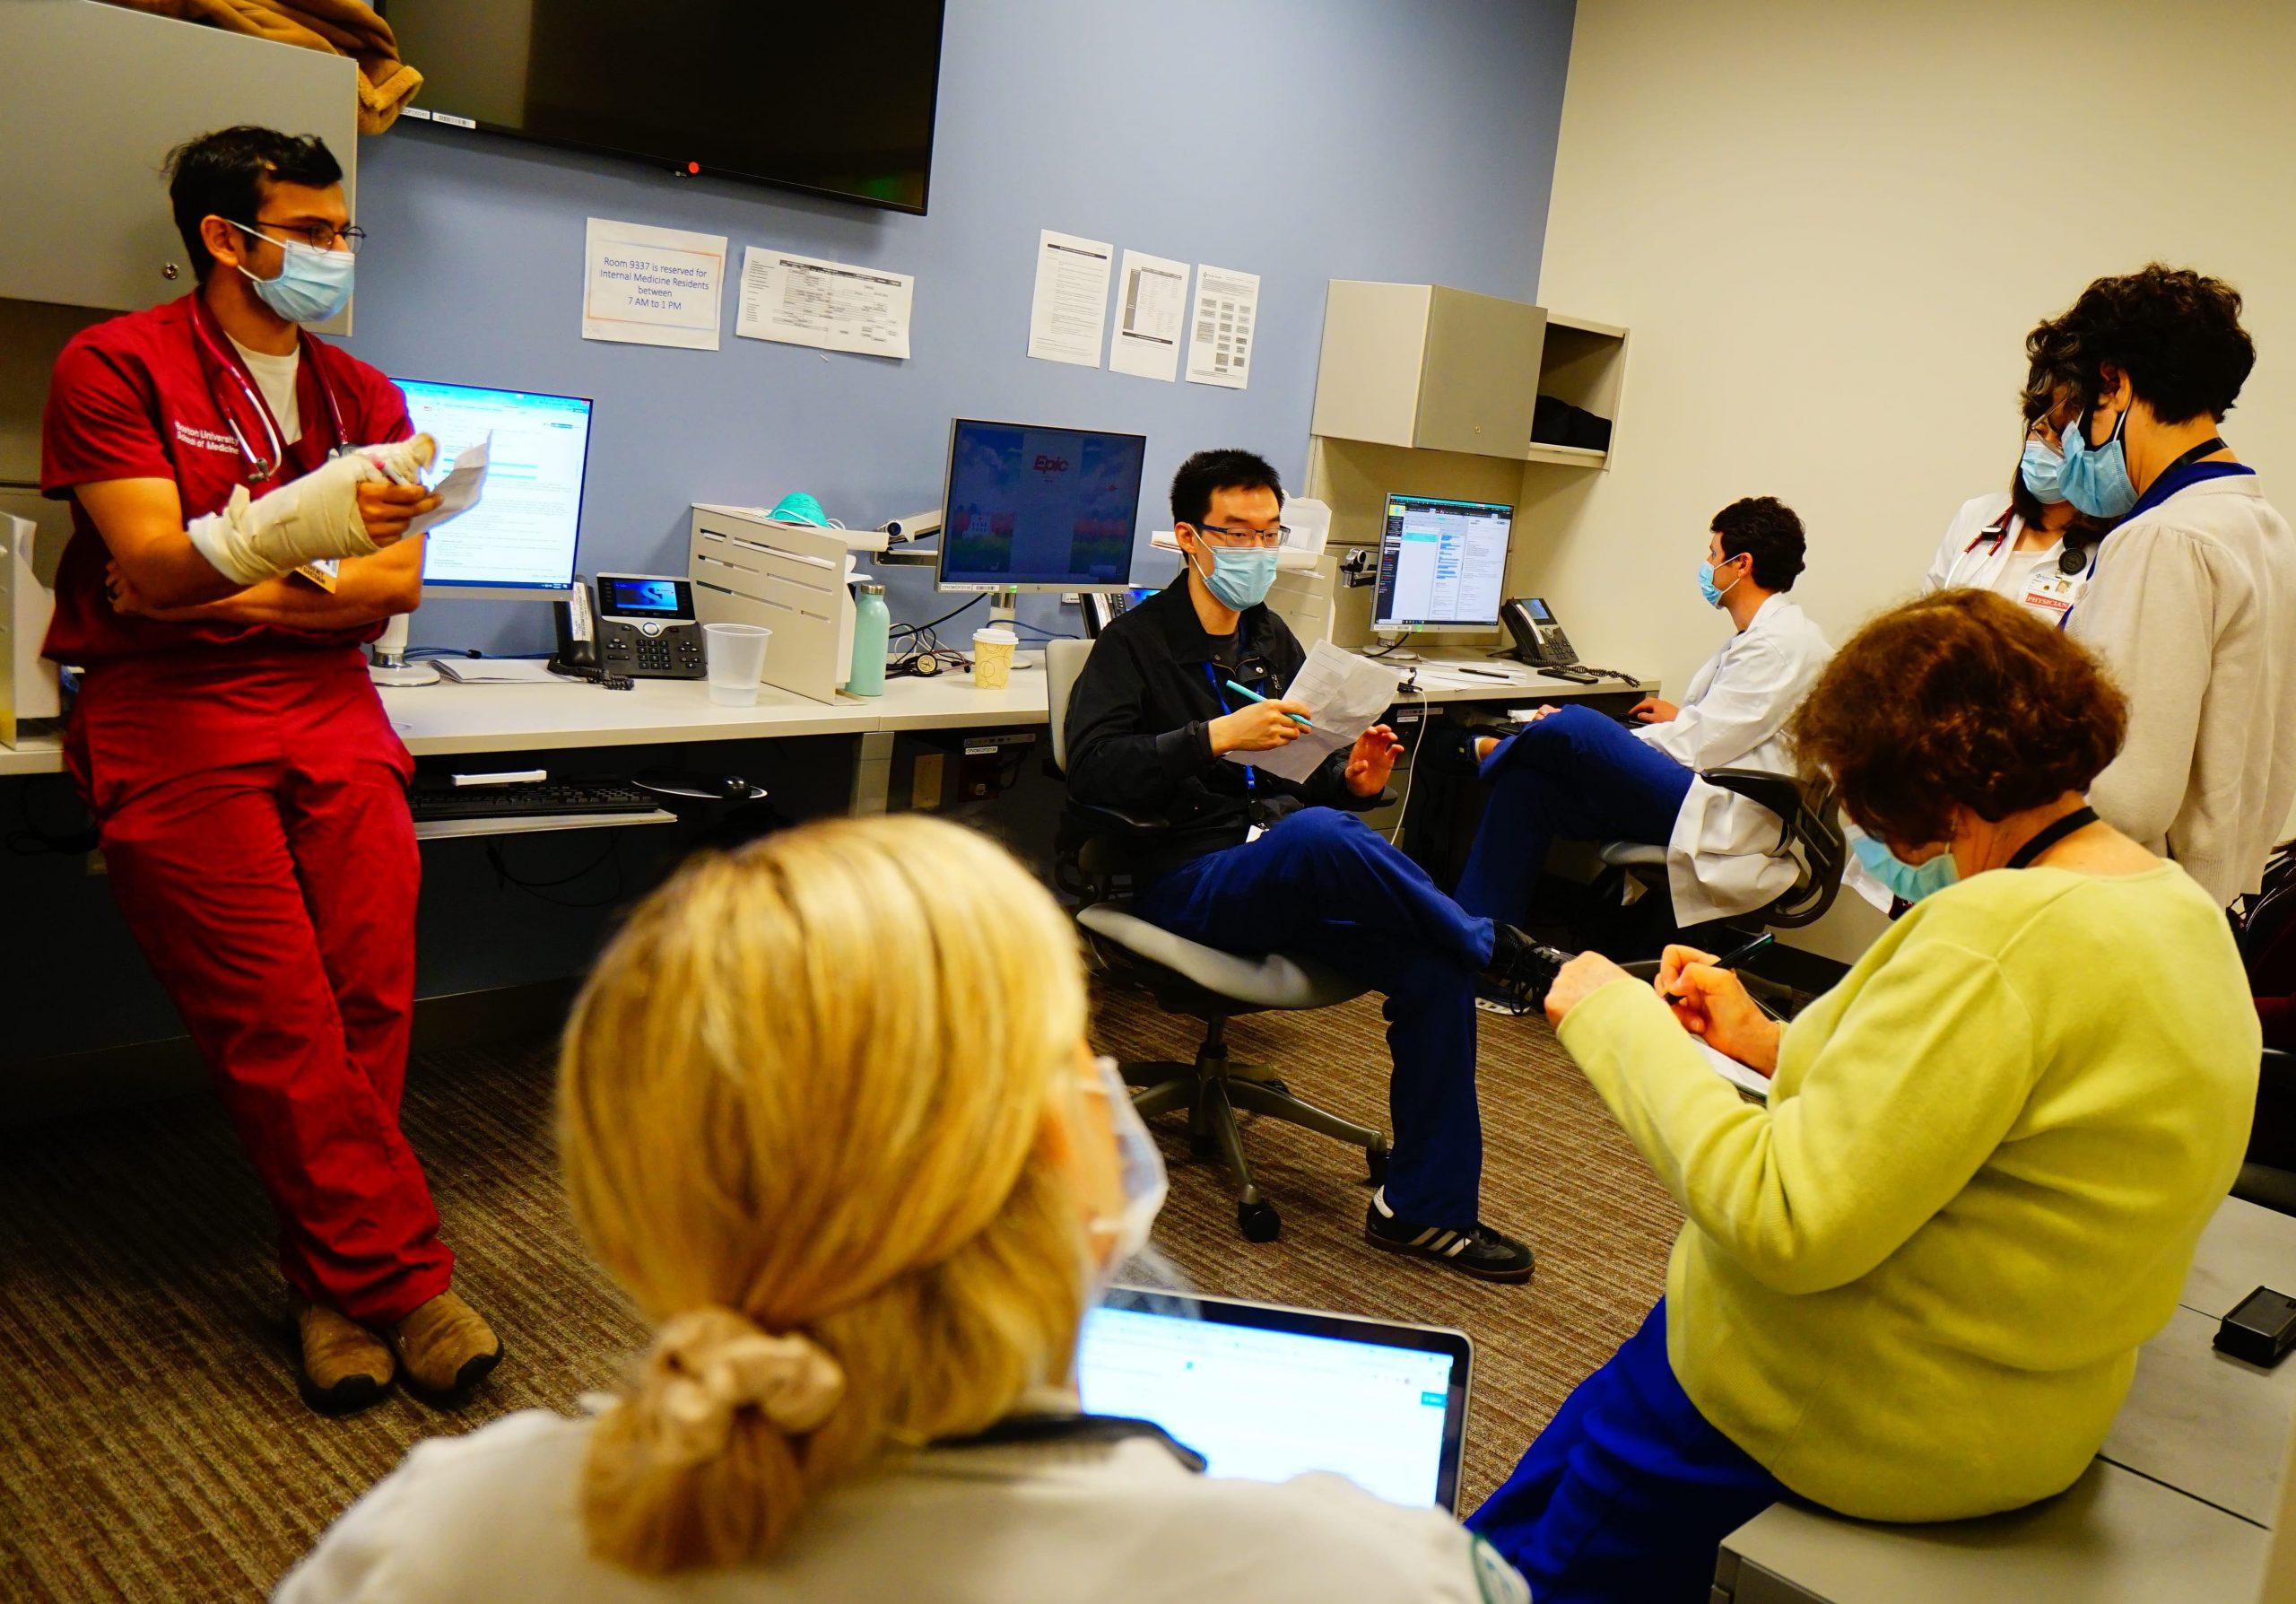 Residents discuss patient cases